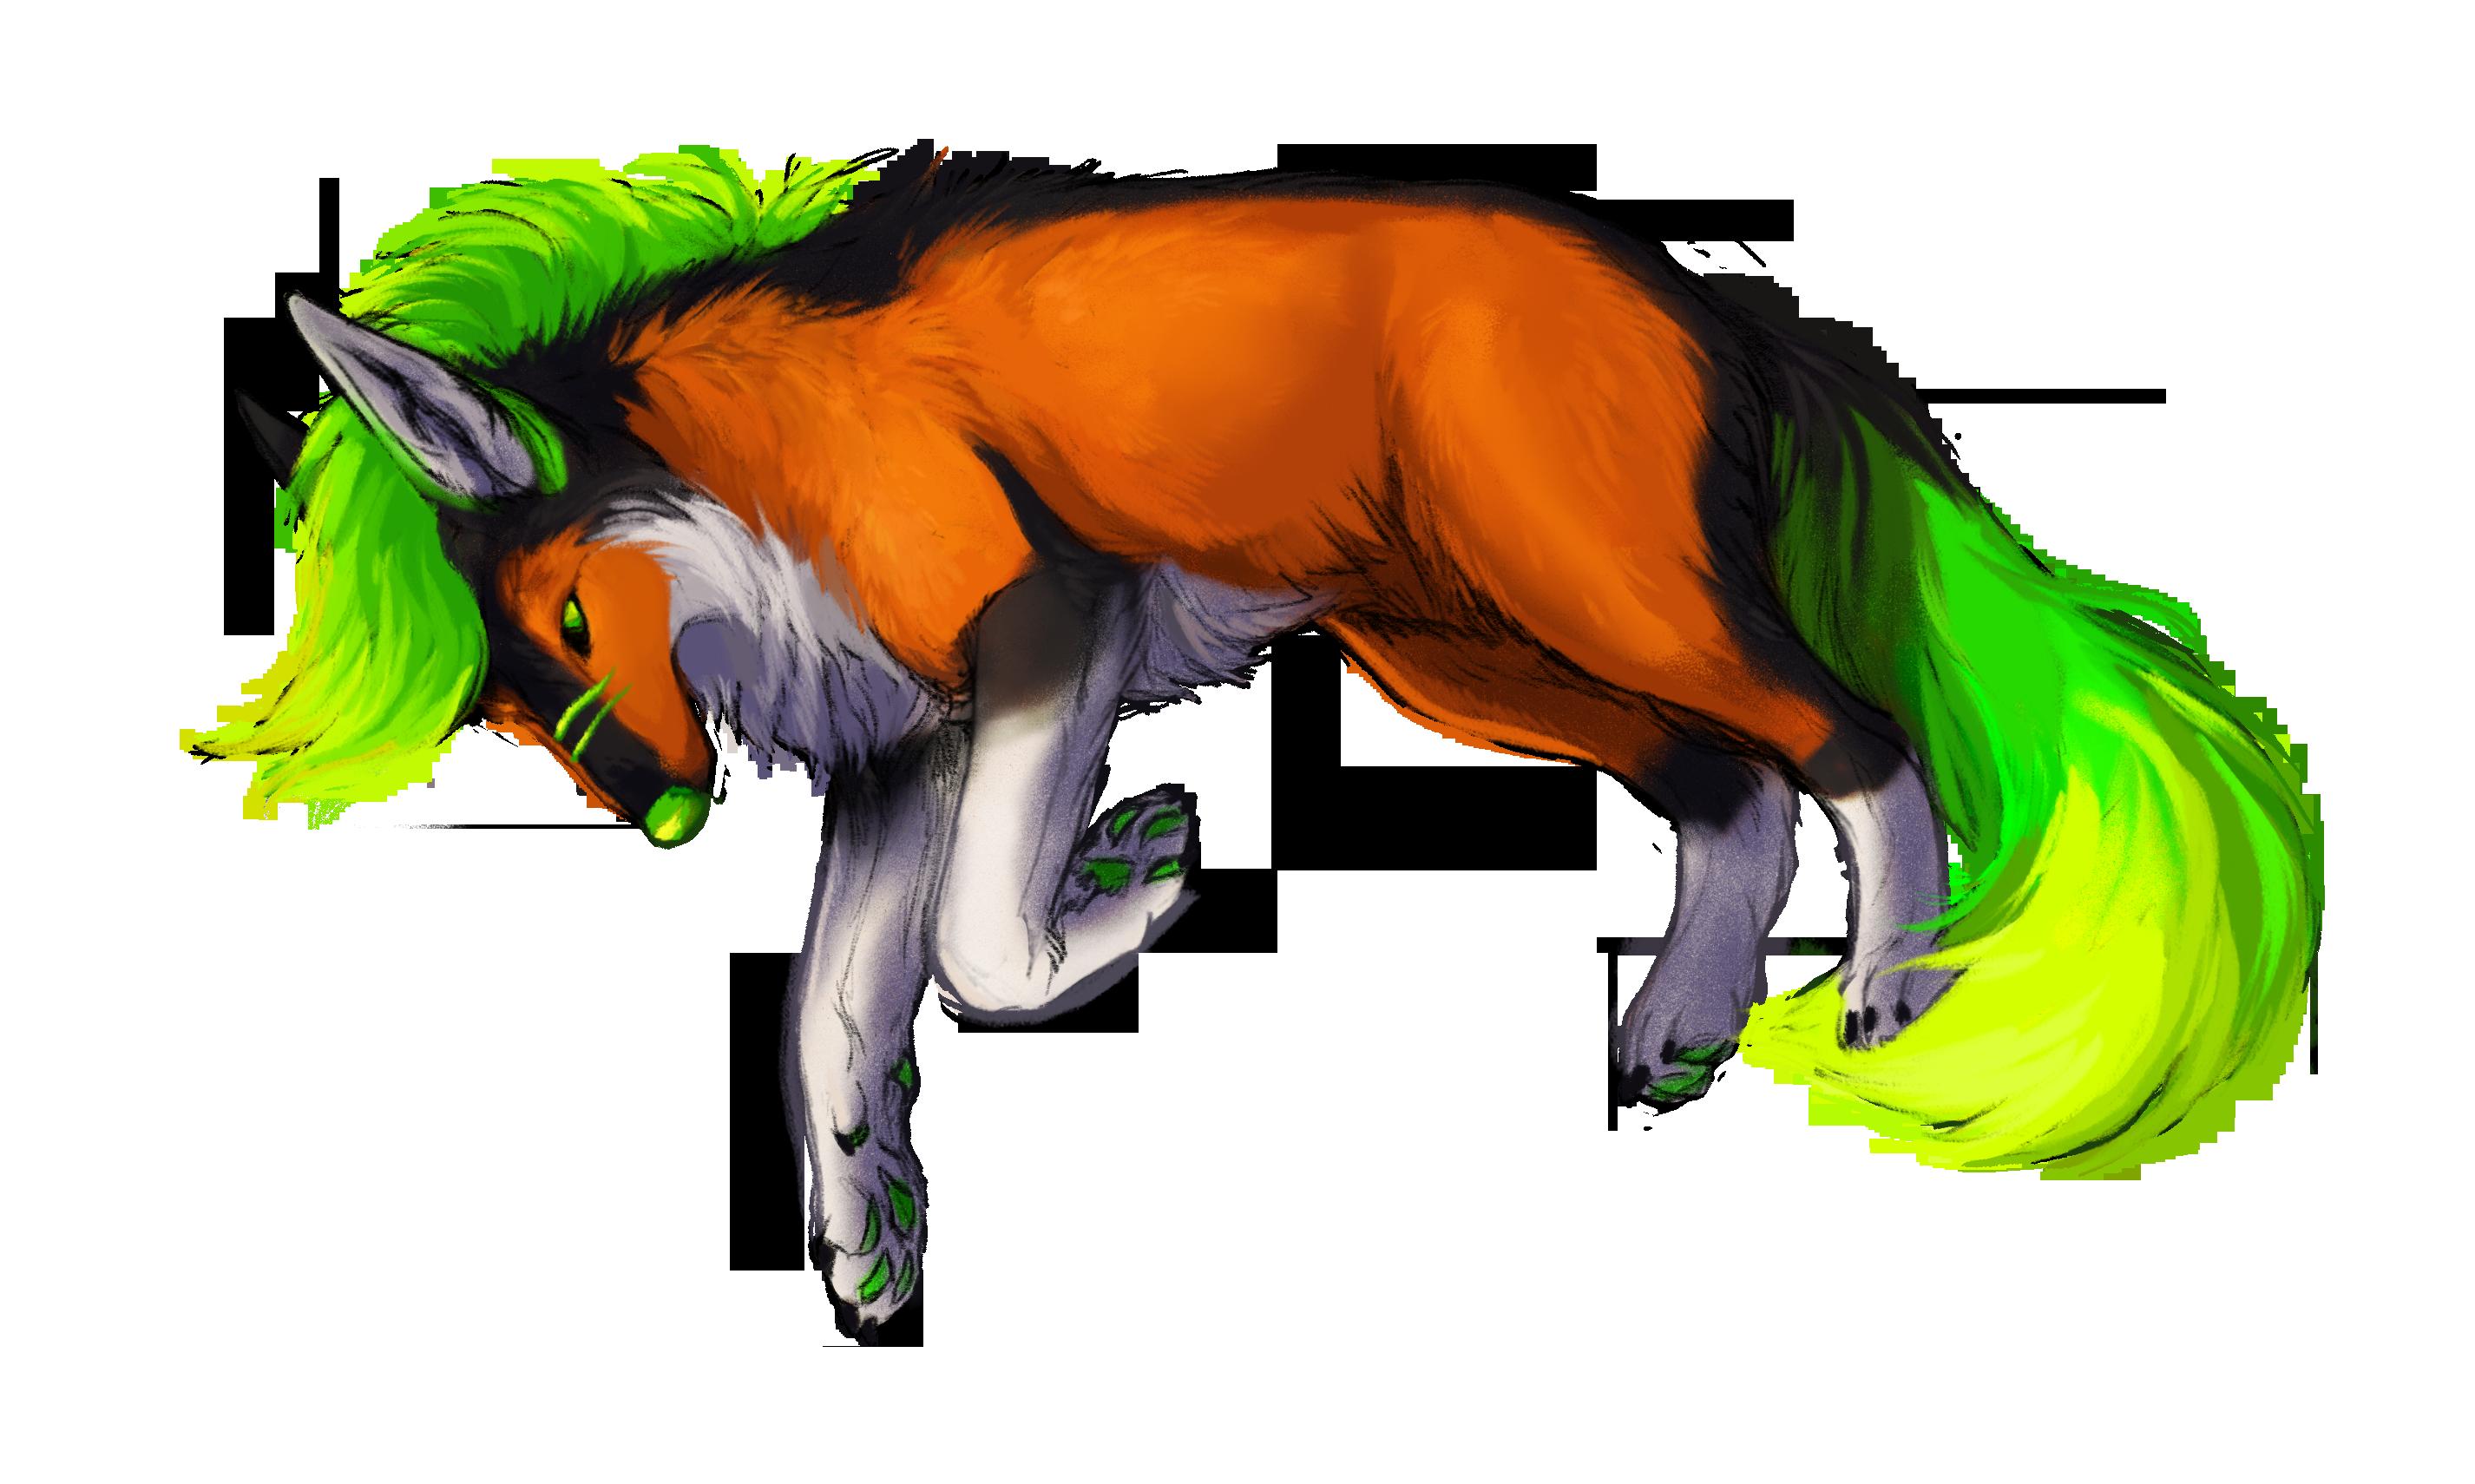 Toxico by markedwolf